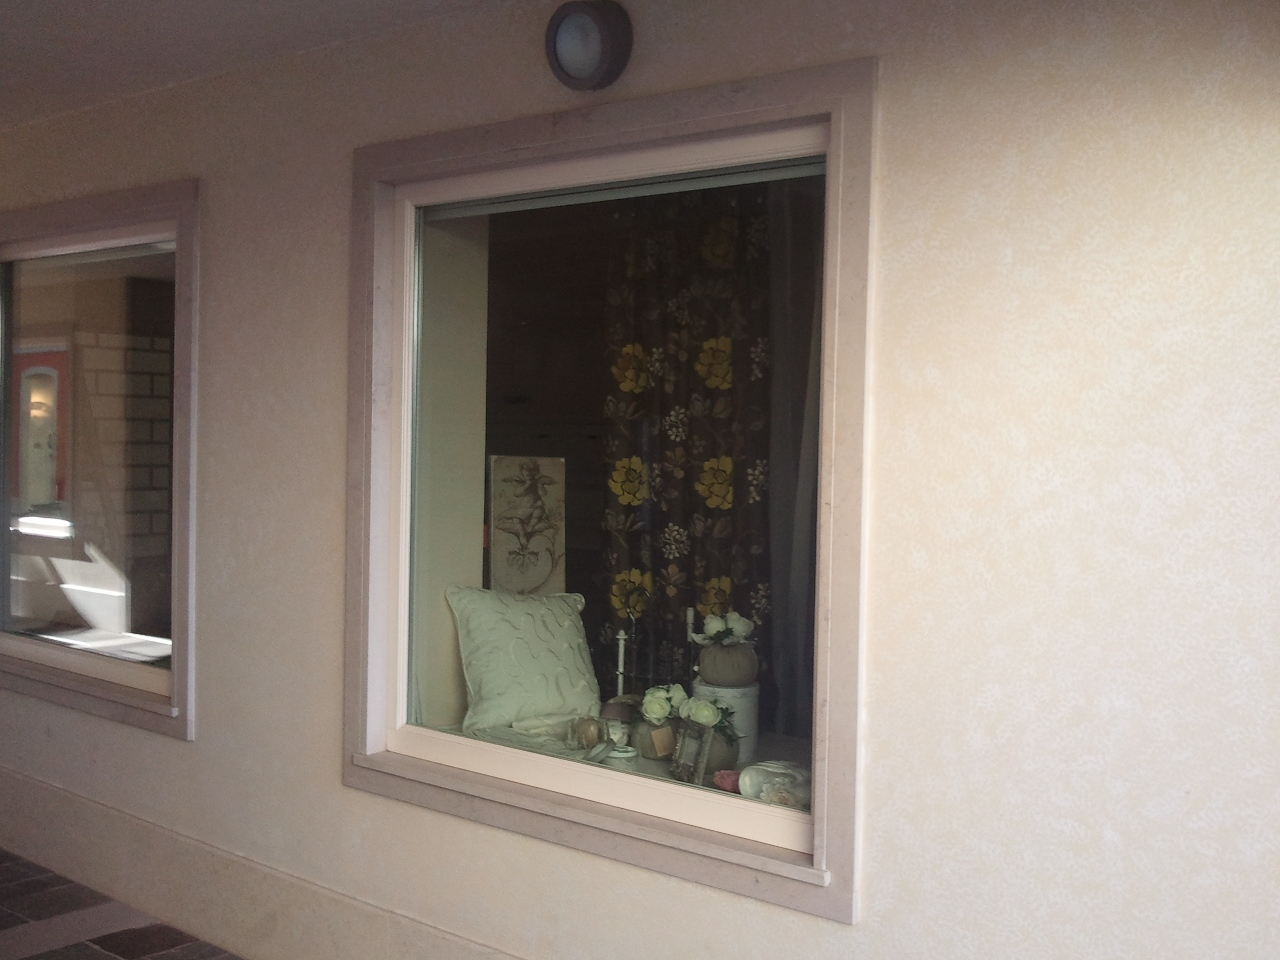 Soglie finestre moderne free soglie per porte e finestre - Soglie per finestre ...